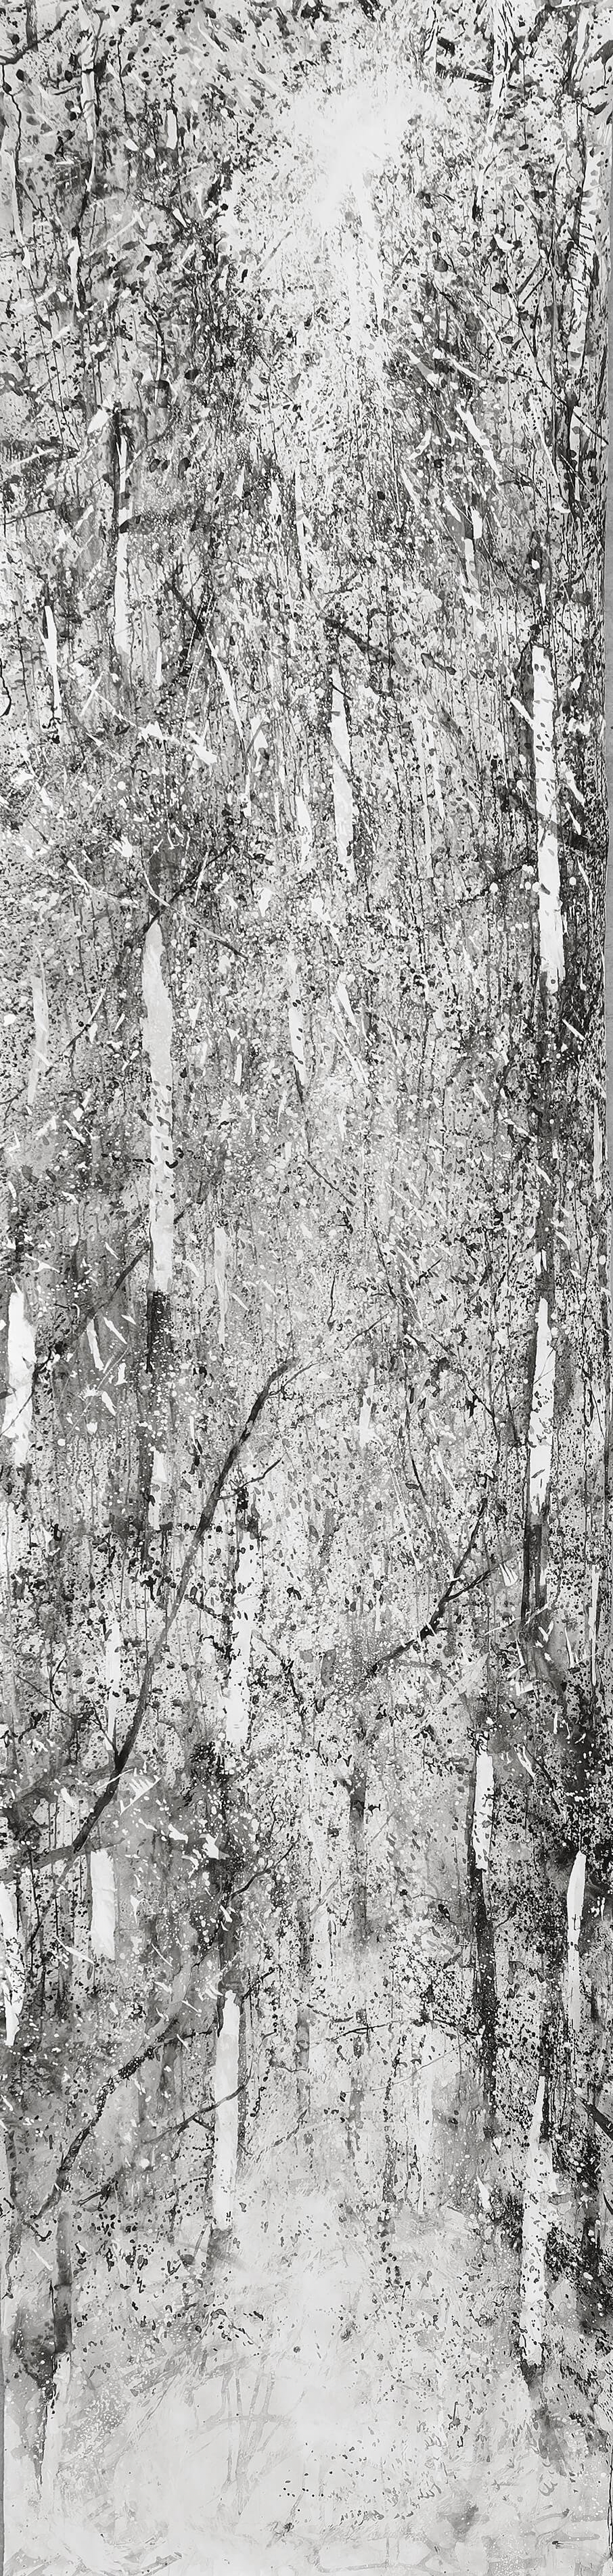 RHSK124 Descending Light in Tengudake Forest ( Ink on Paper ) 560 x 136 cm